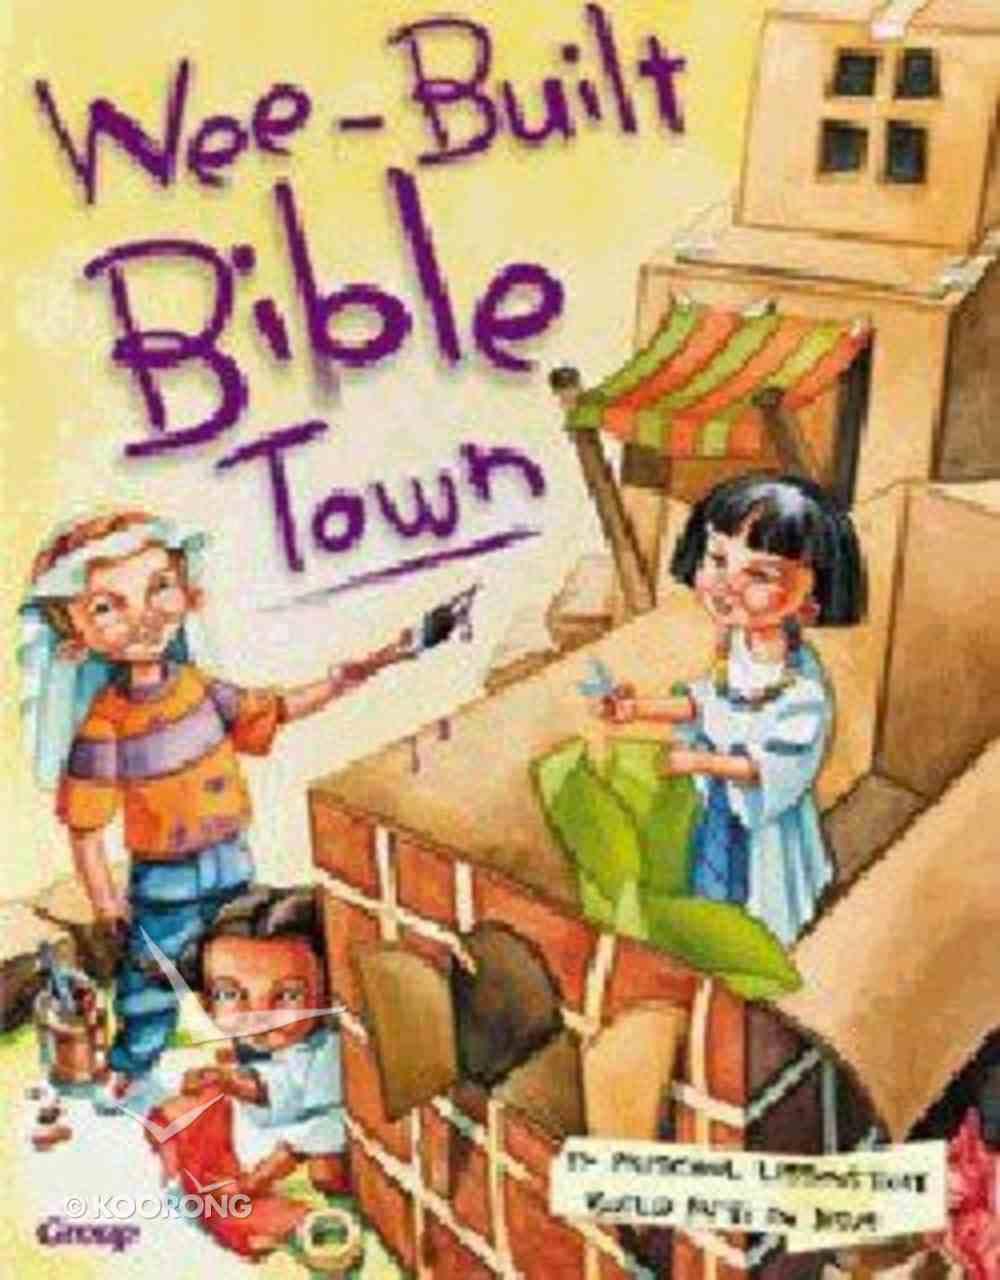 Wee: Built Bible Town (13 Preschool Lessons) Paperback